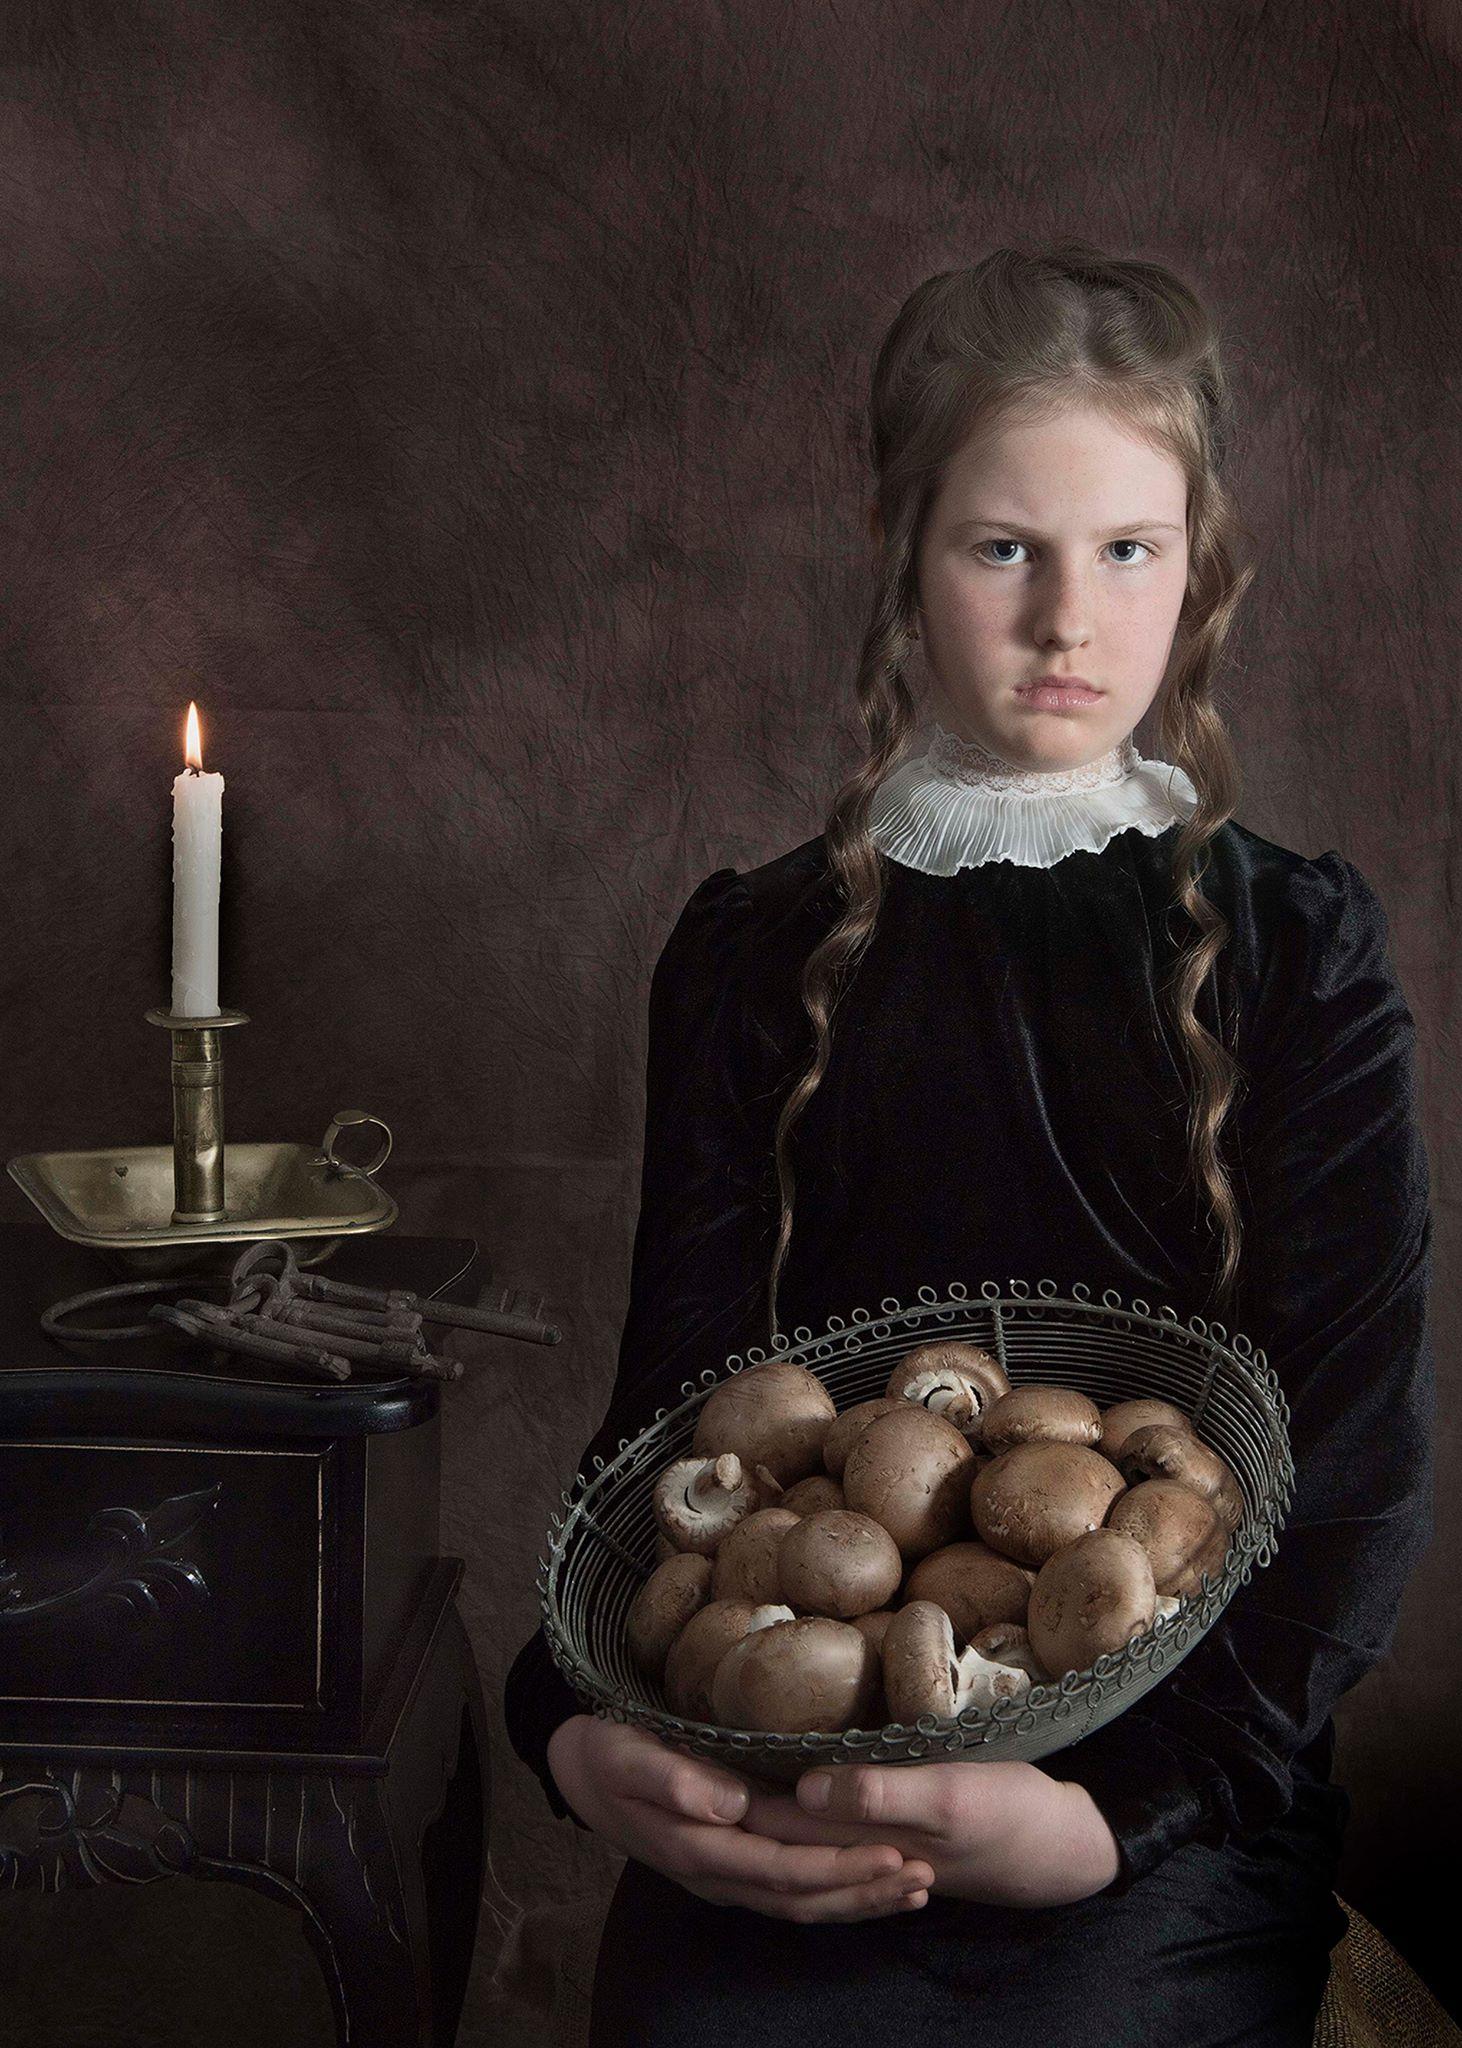 broccoli, Magdalena Walczak; mosthated, mosthatedvegetables, phoode; vegetables; kidsfood; foodphotography; foodstyling; foodprojects; healtyfood; foodadvertising, mushroom